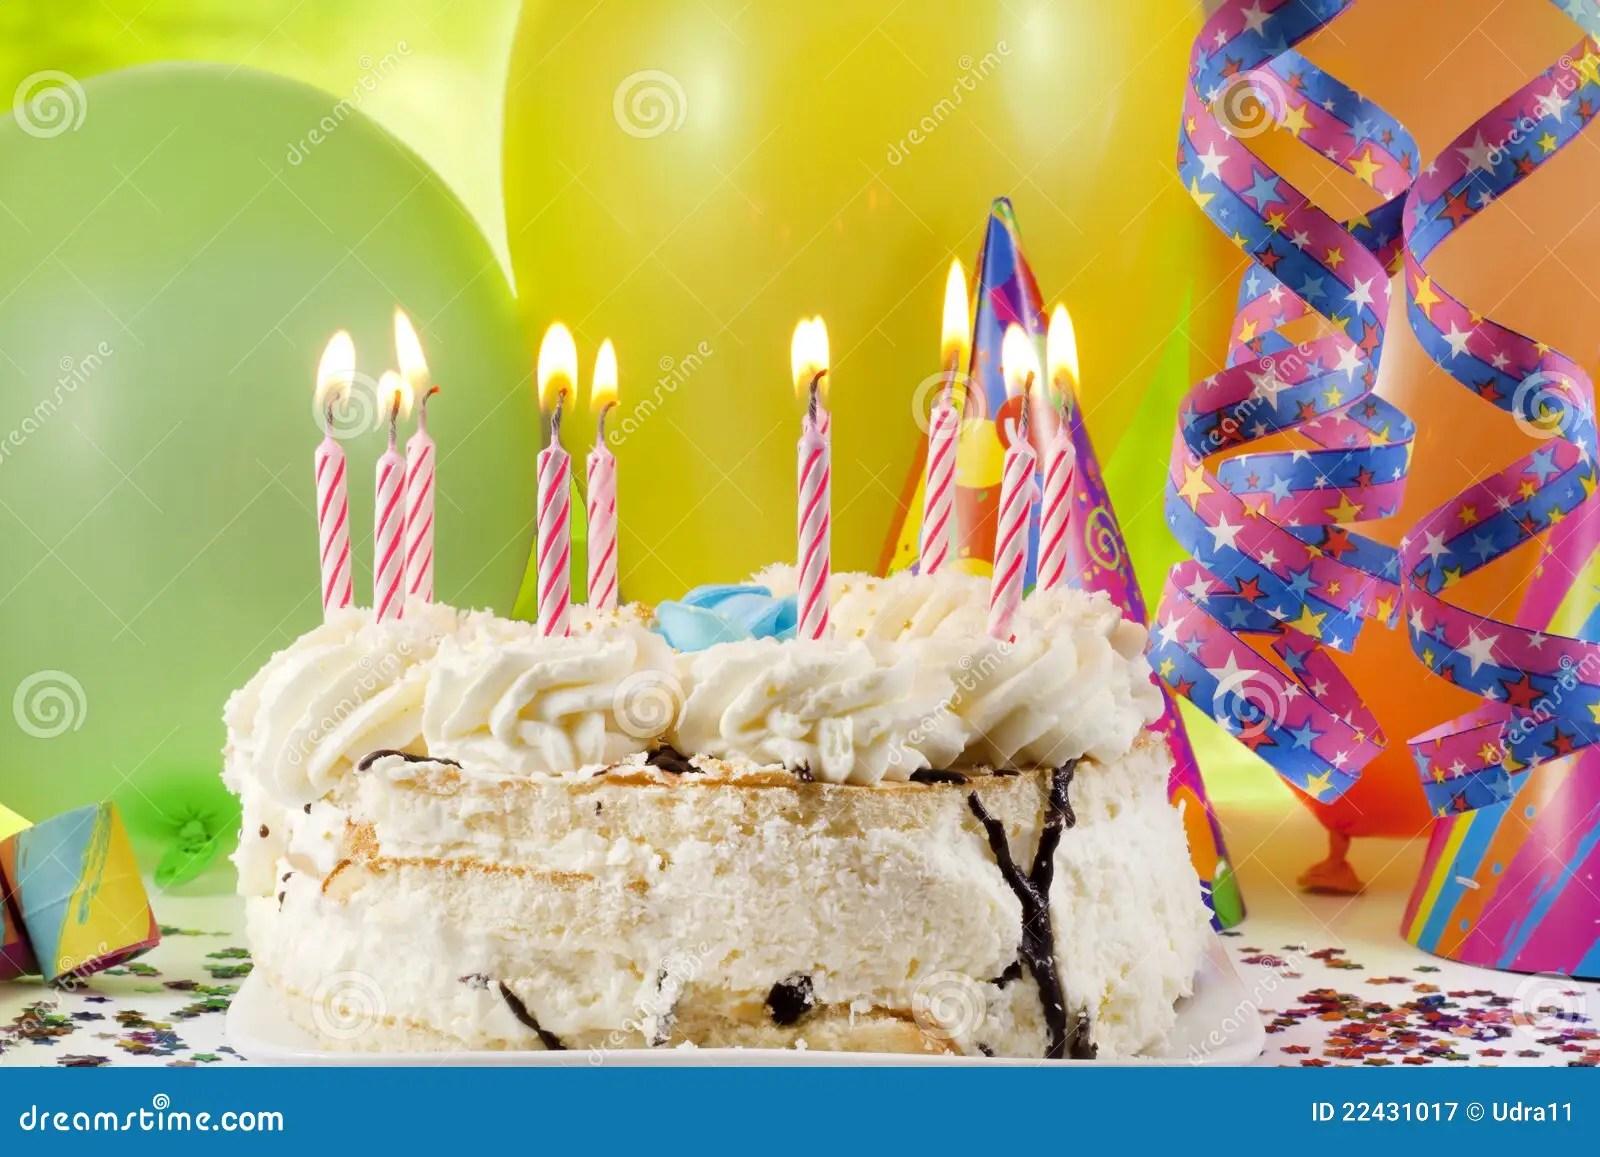 Birthday Cake And Colorful Background Stock Image Image